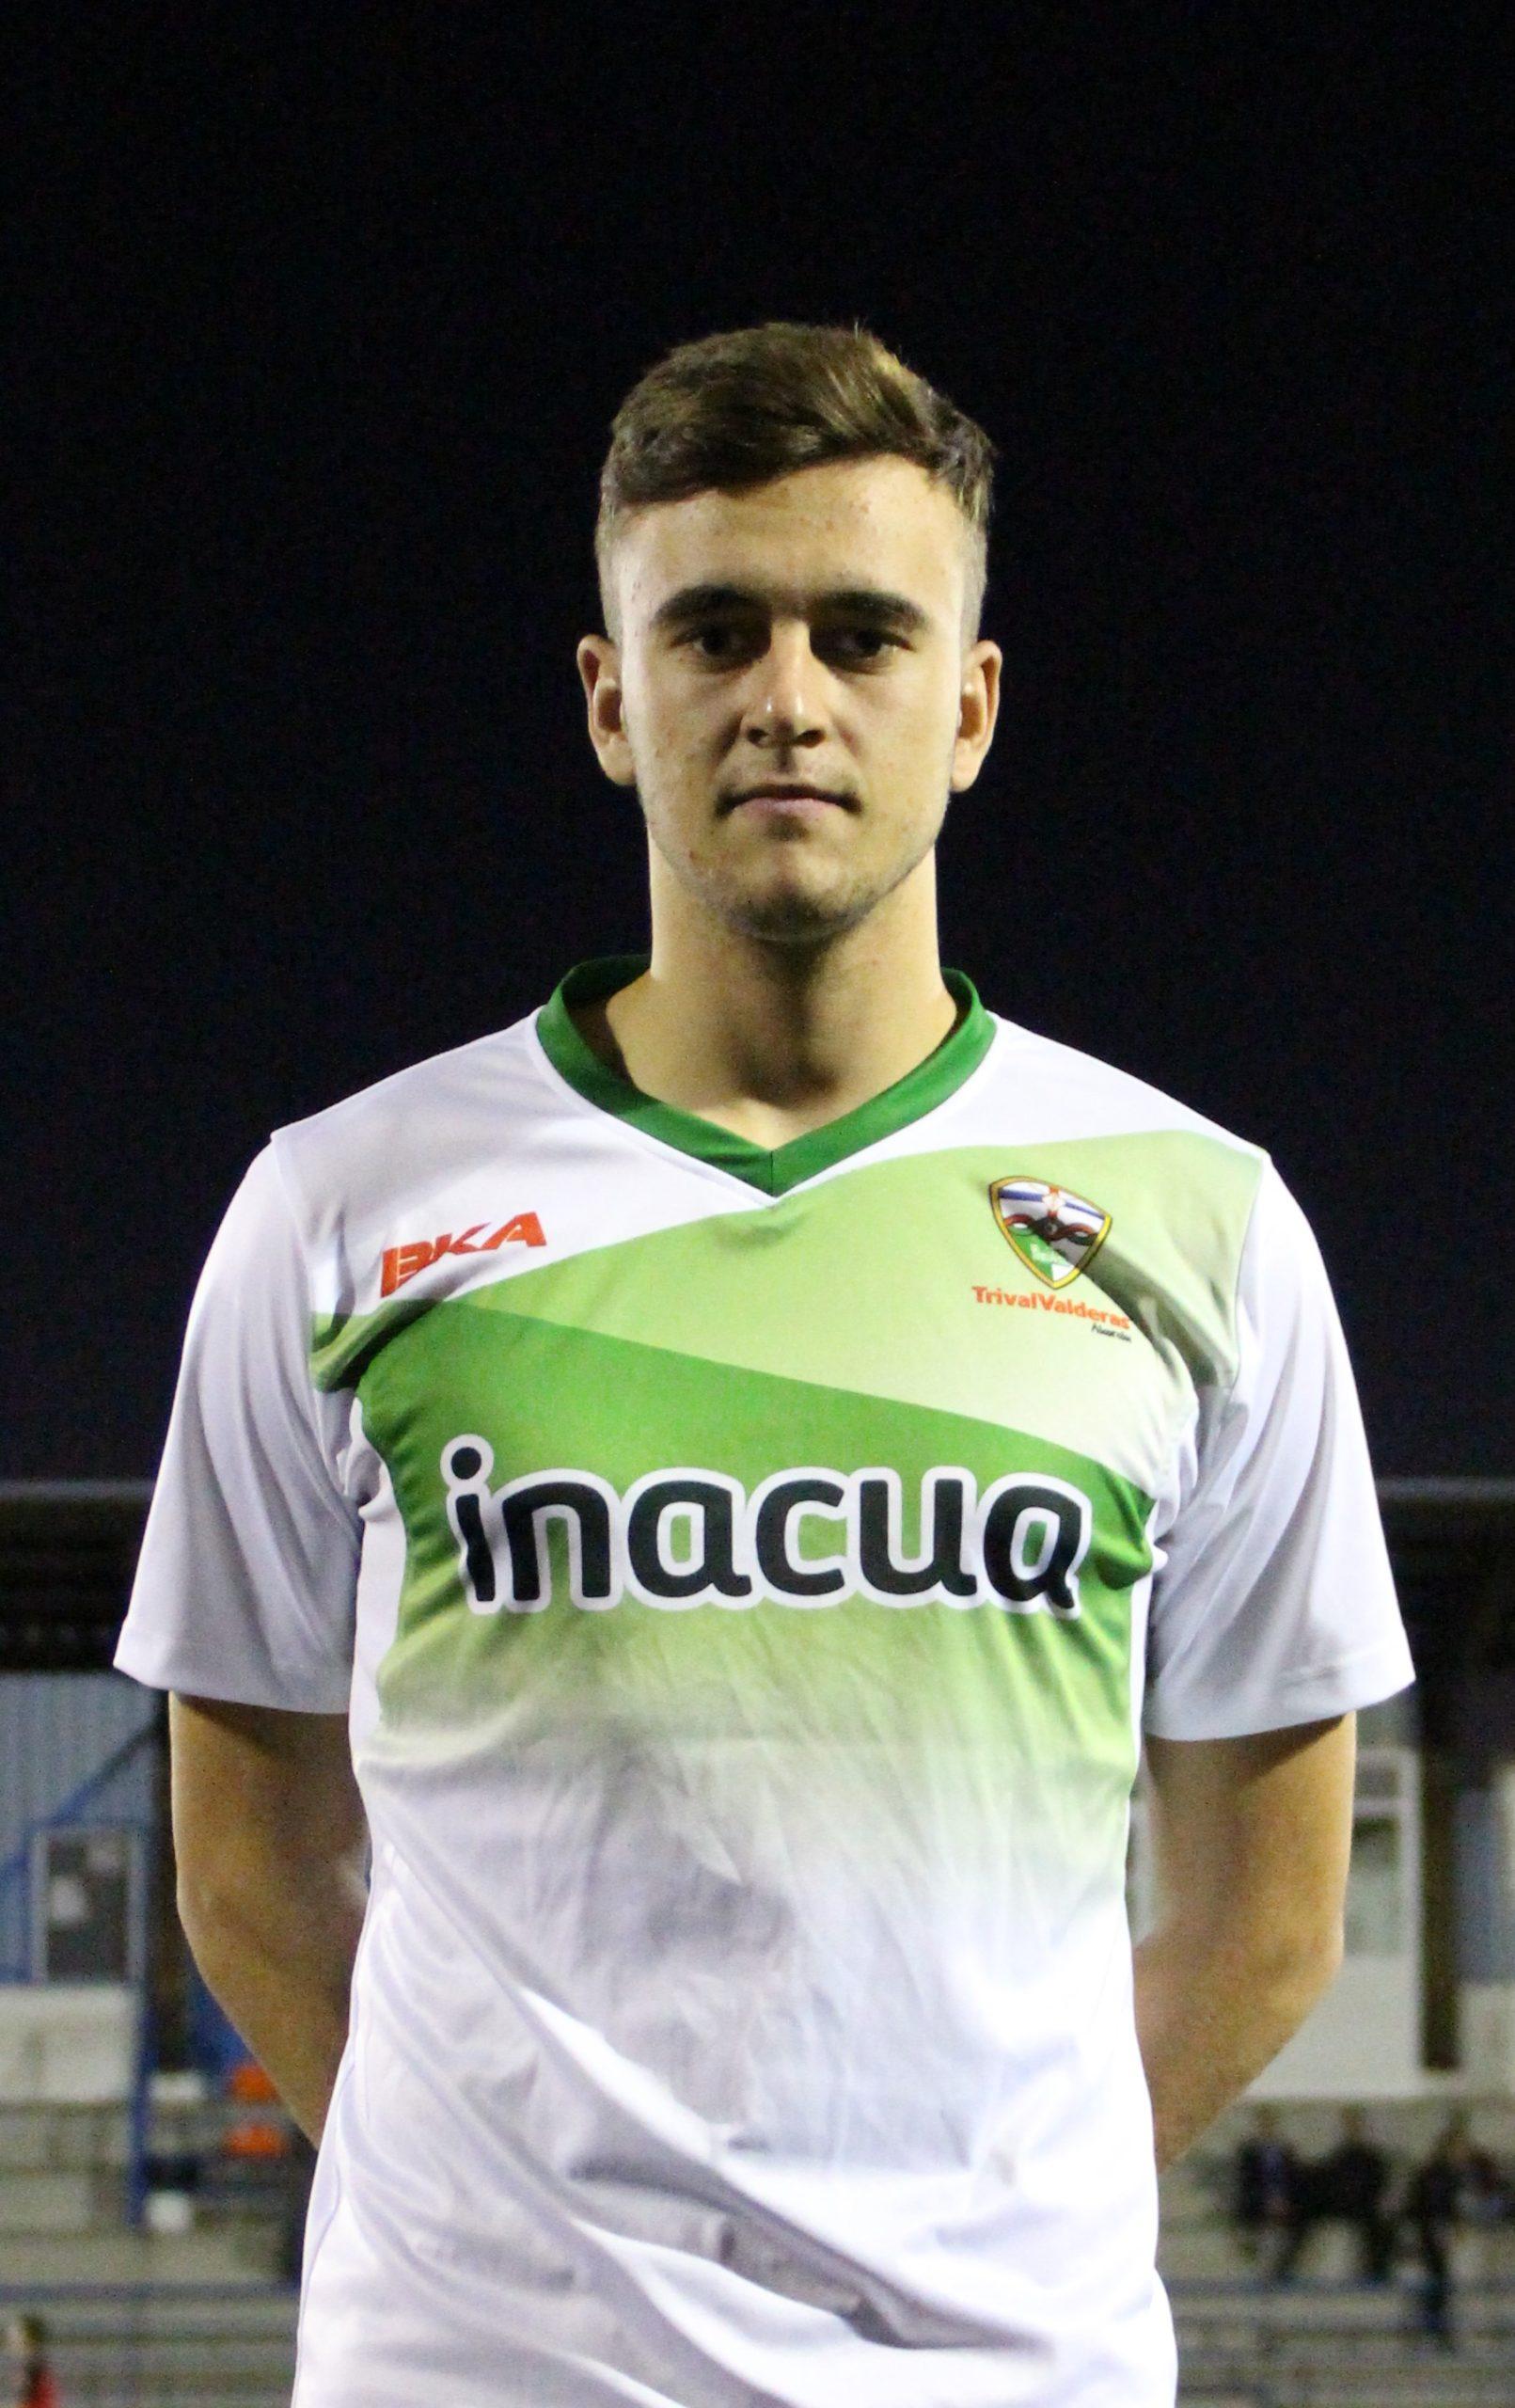 Alejandro Ollero Arias